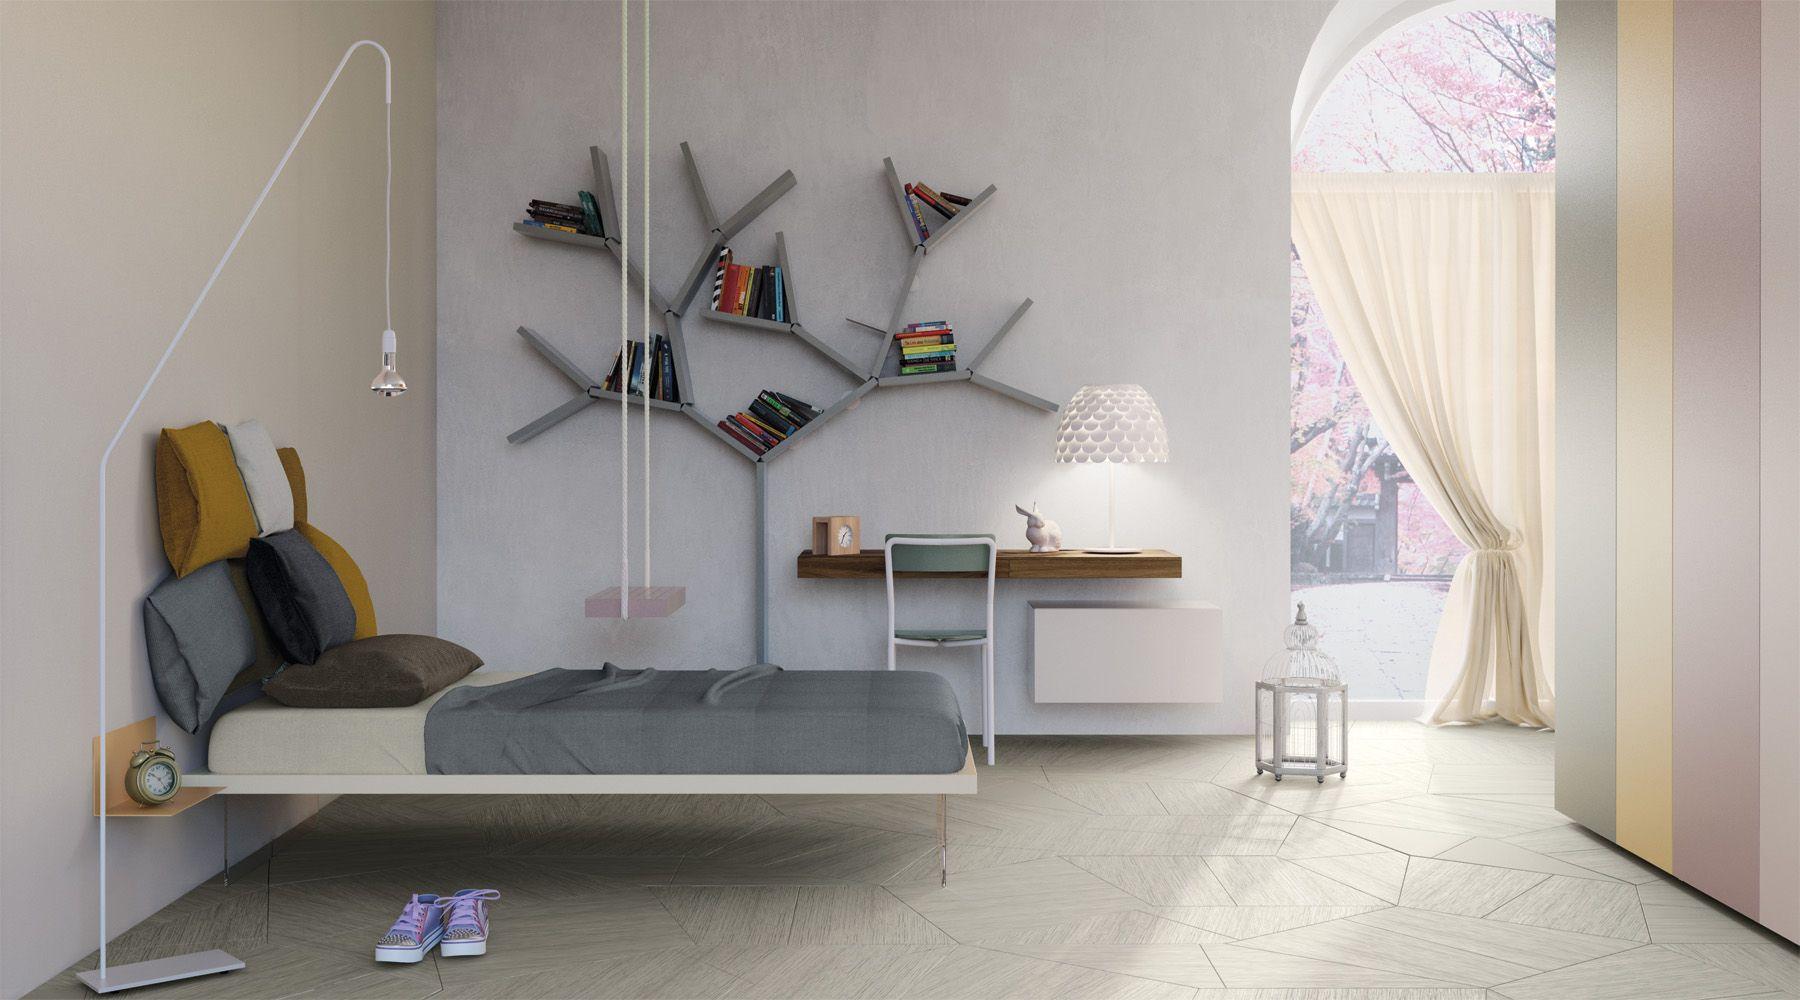 Camerette Provenzali ~ Diagolinea shelf lago modular camerette design